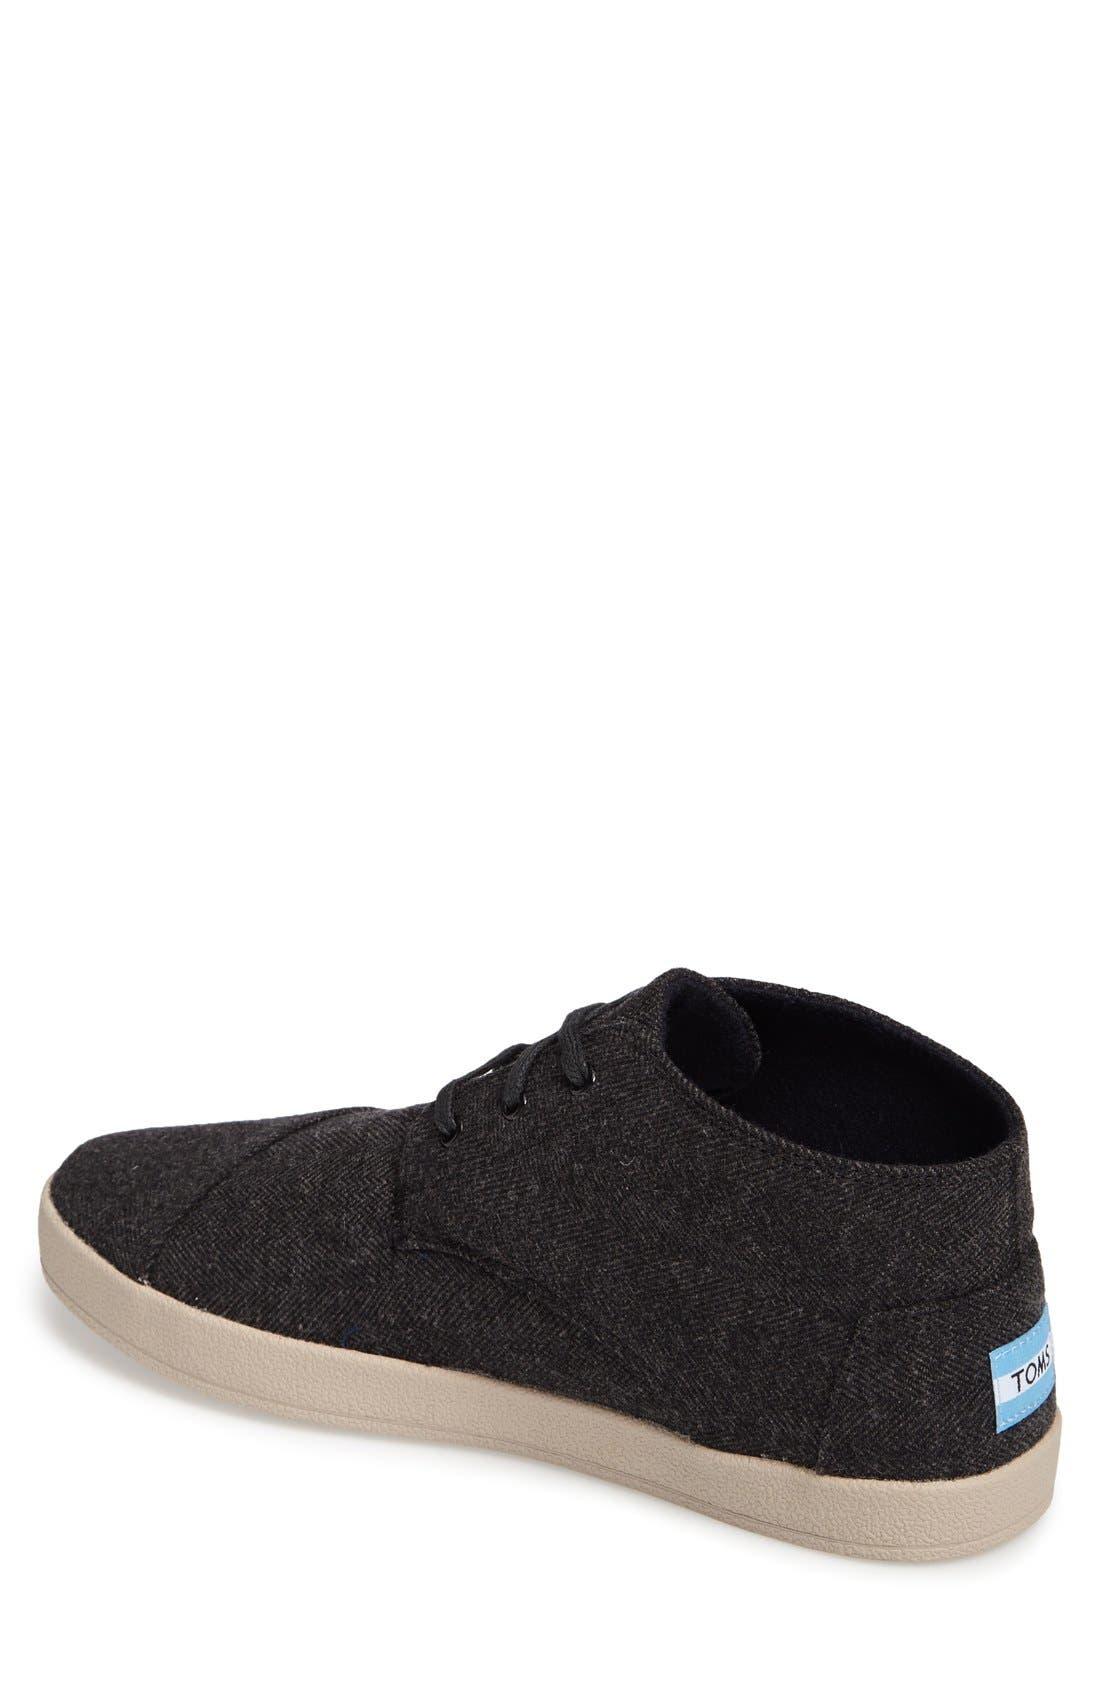 'Paseo Mid' Sneaker,                             Alternate thumbnail 2, color,                             Grey